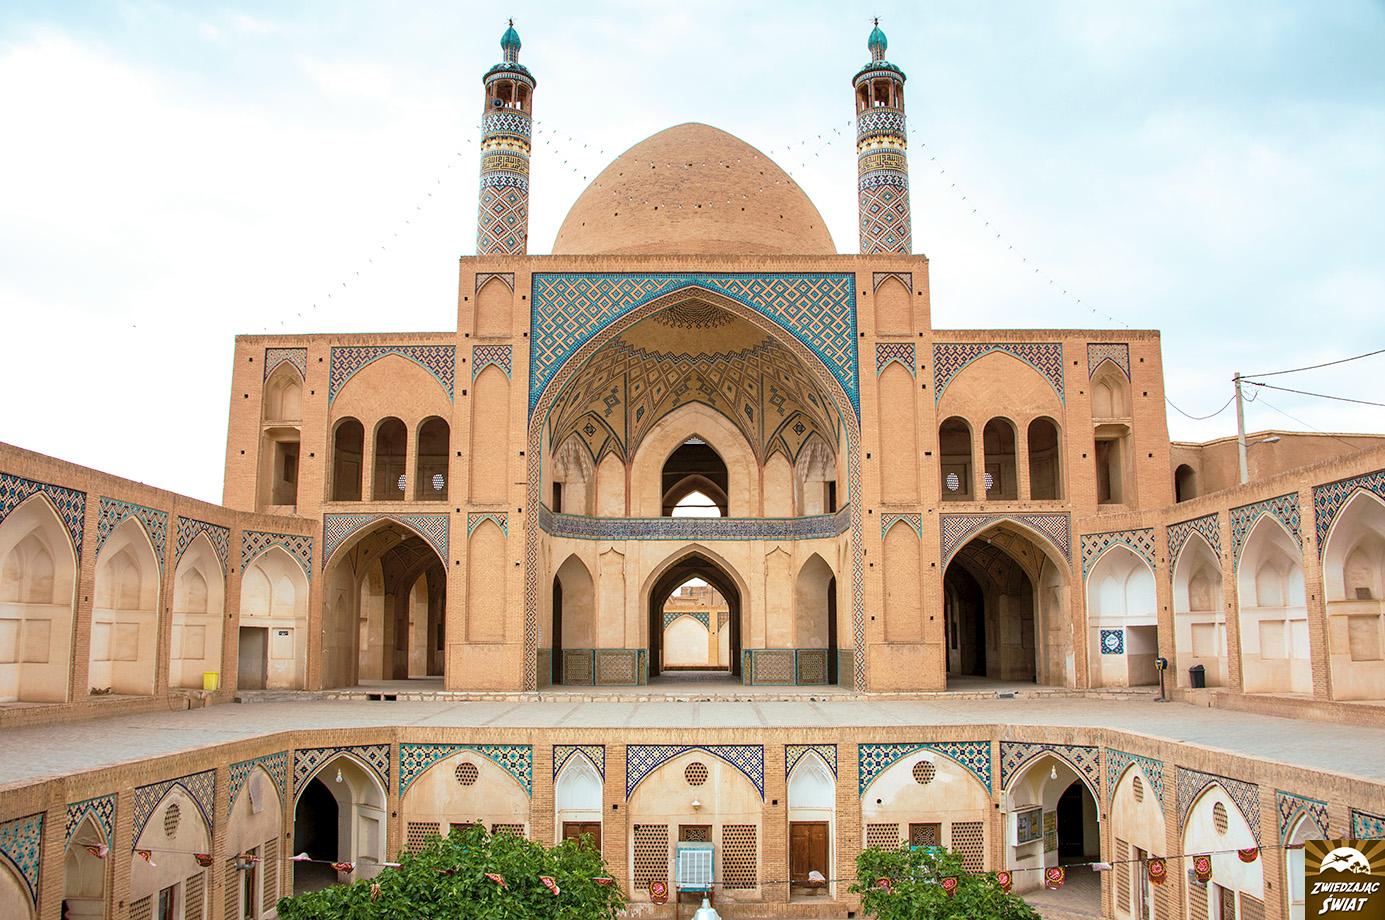 Meczet Agha Bozorg, Kaszan, Iran